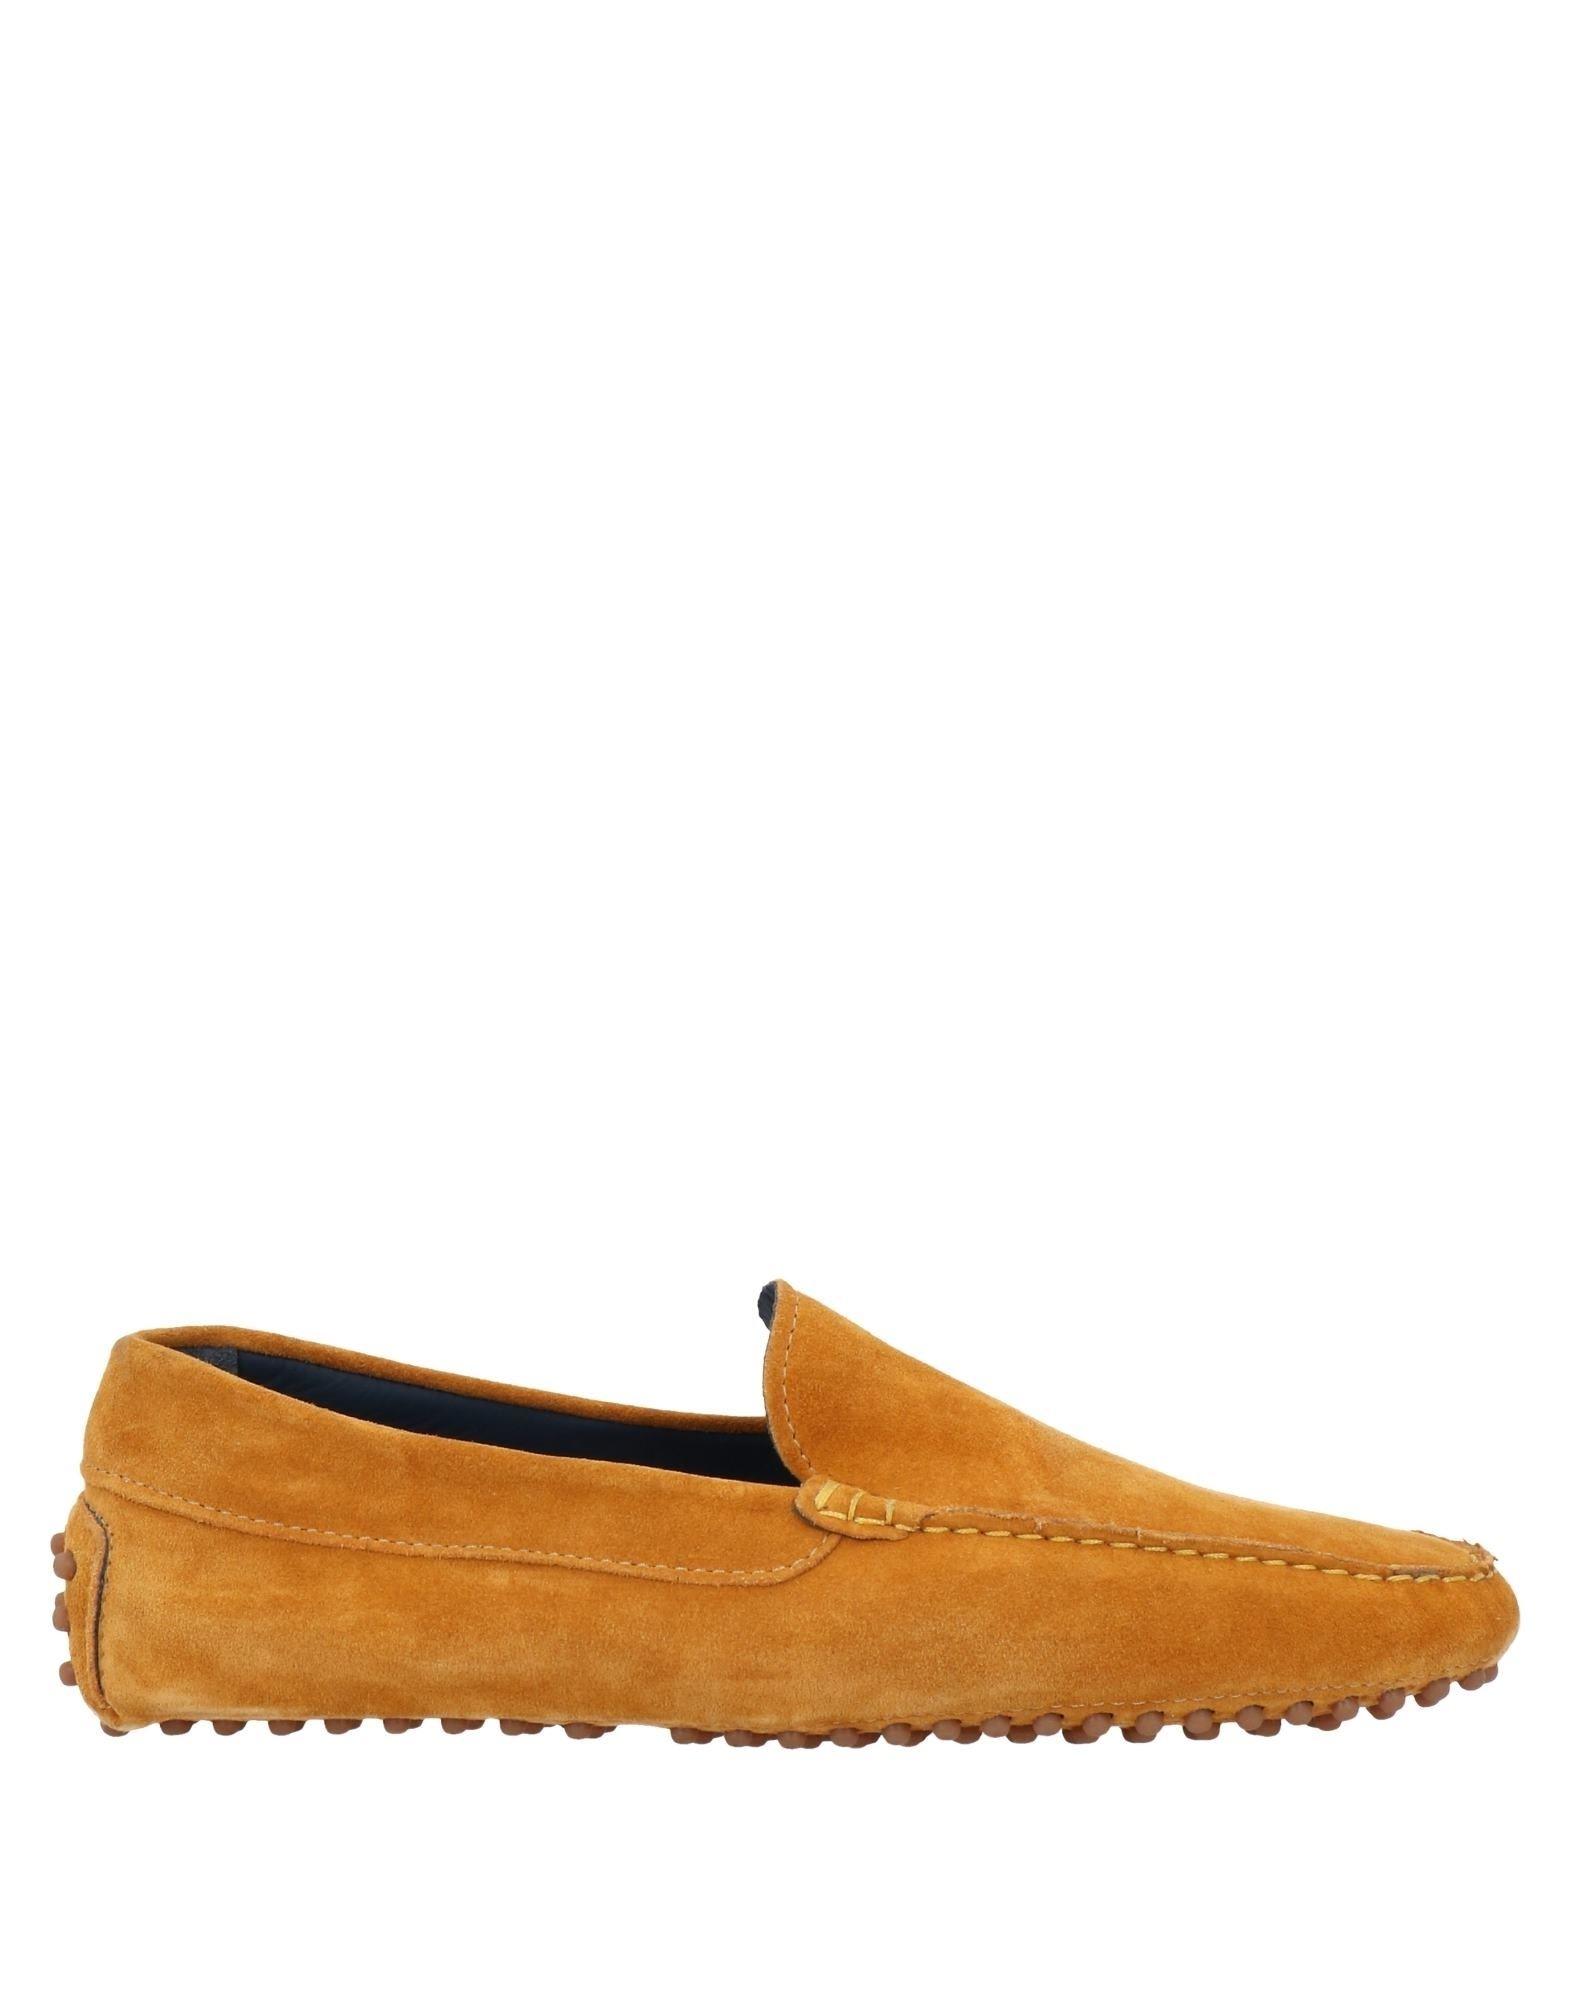 Alexander Trend Loafers In Orange